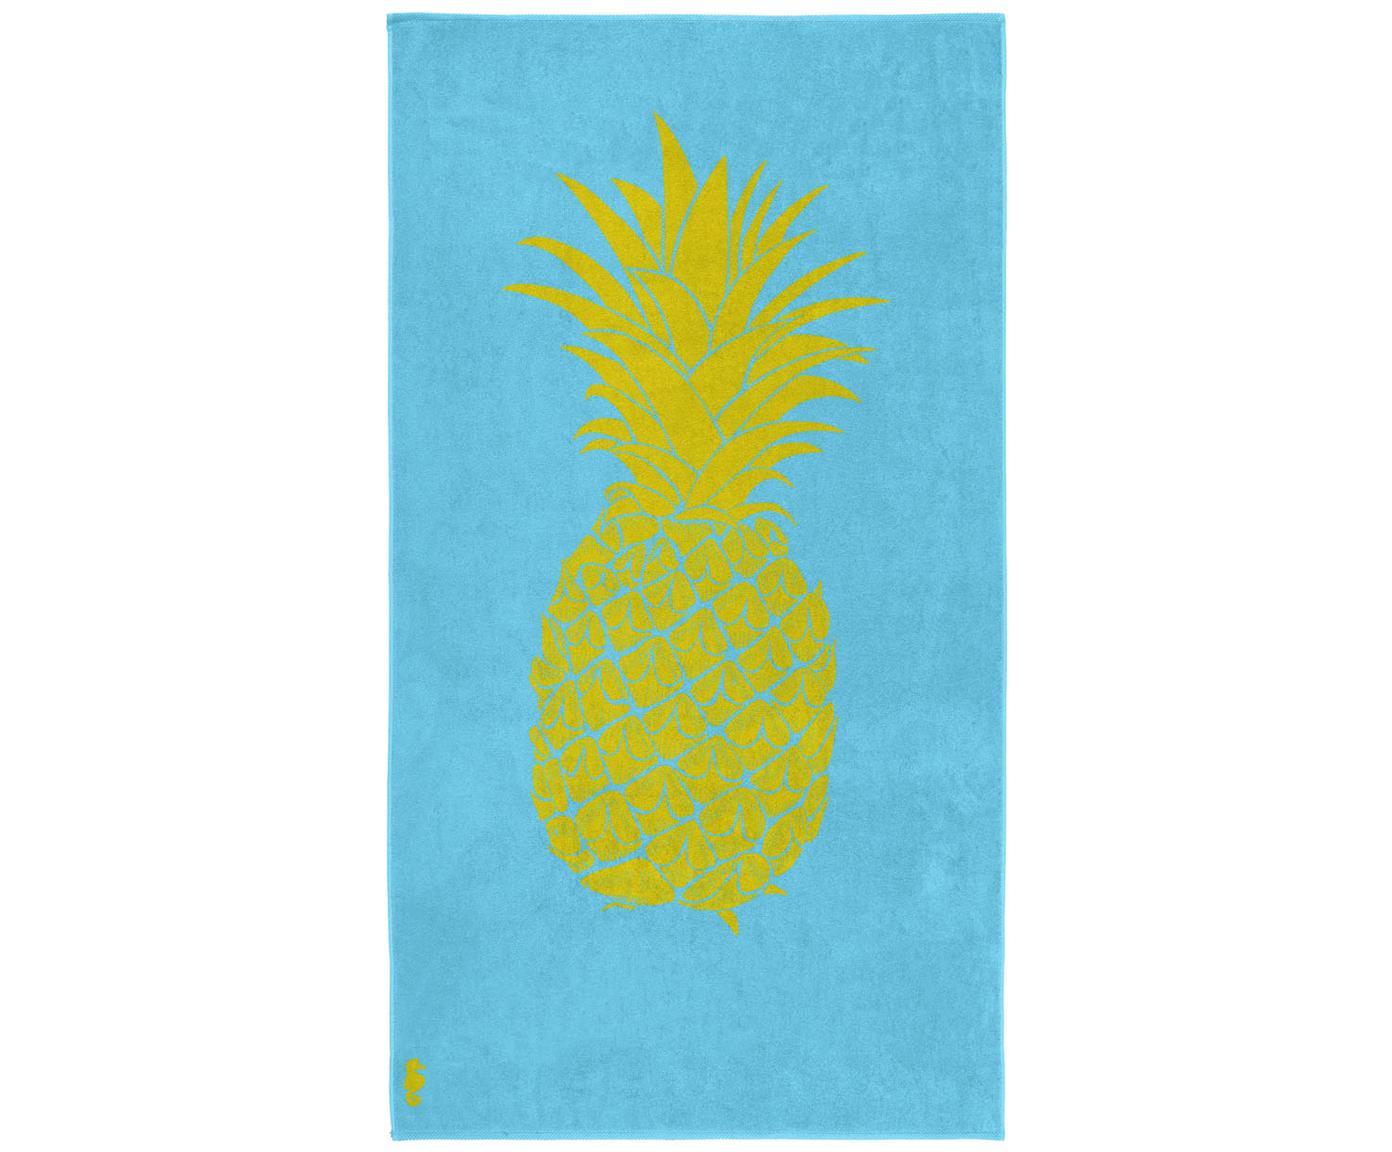 Strandlaken Ananas, Fluweel (katoen) middelzware stofkwaliteit, 420g/m², Lichtblauw, geel, 100 x 180 cm